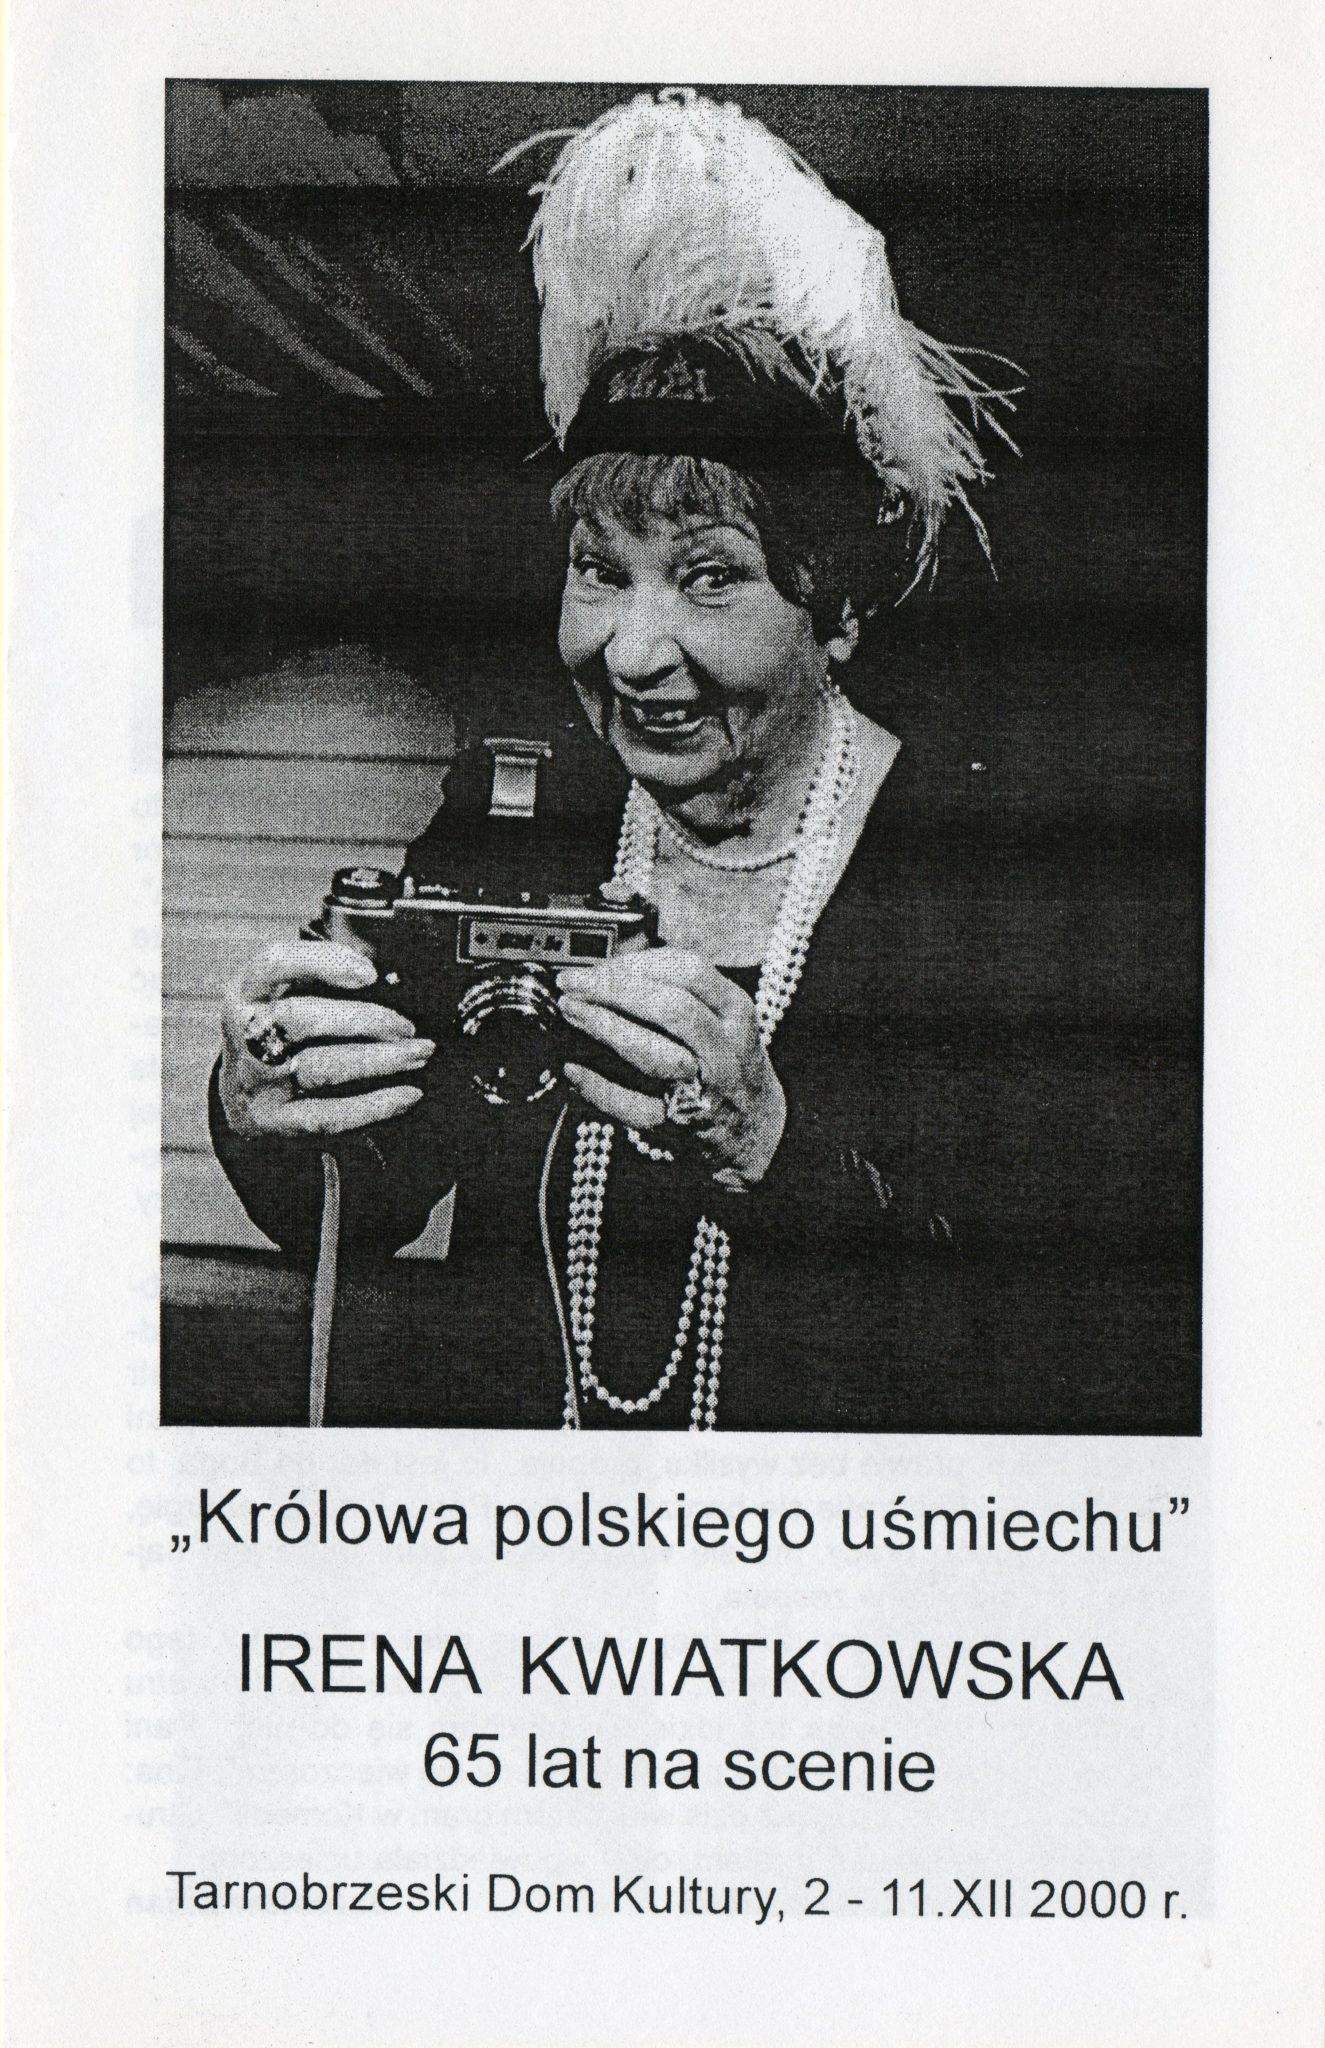 Irena Kwiatkowska 65 lat nascenie